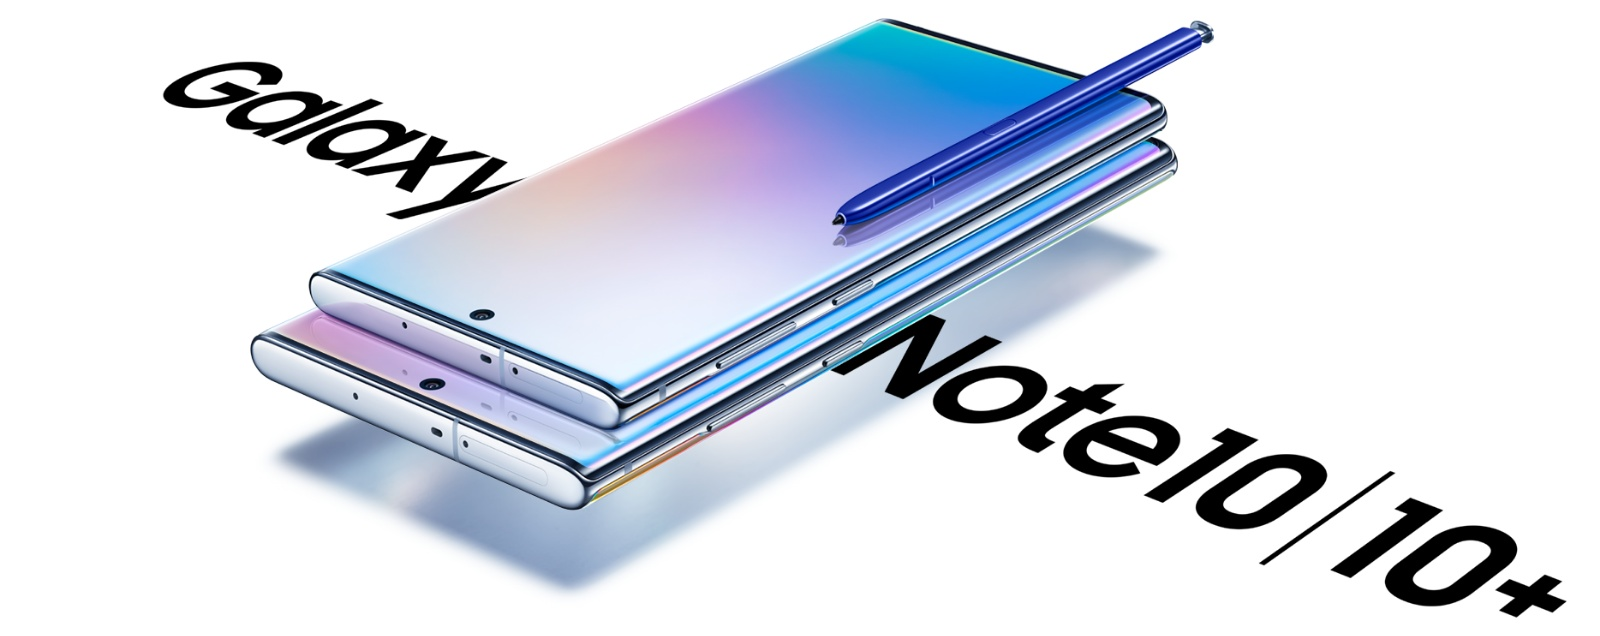 Galaxy Note10 | 10+